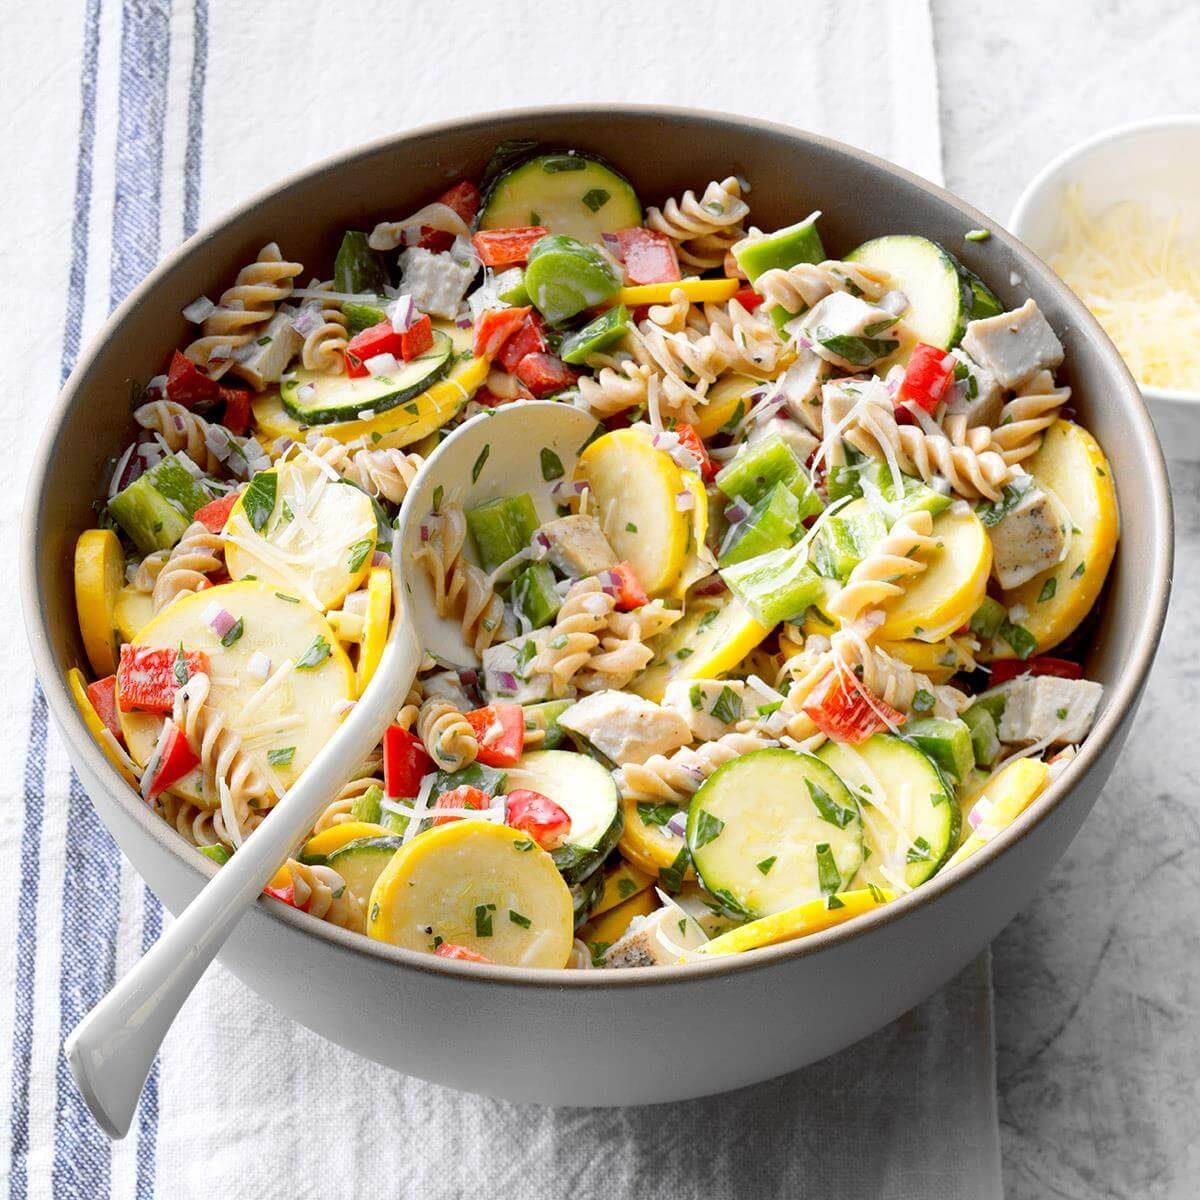 Grandma's Favorite Pasta Salad Recipes